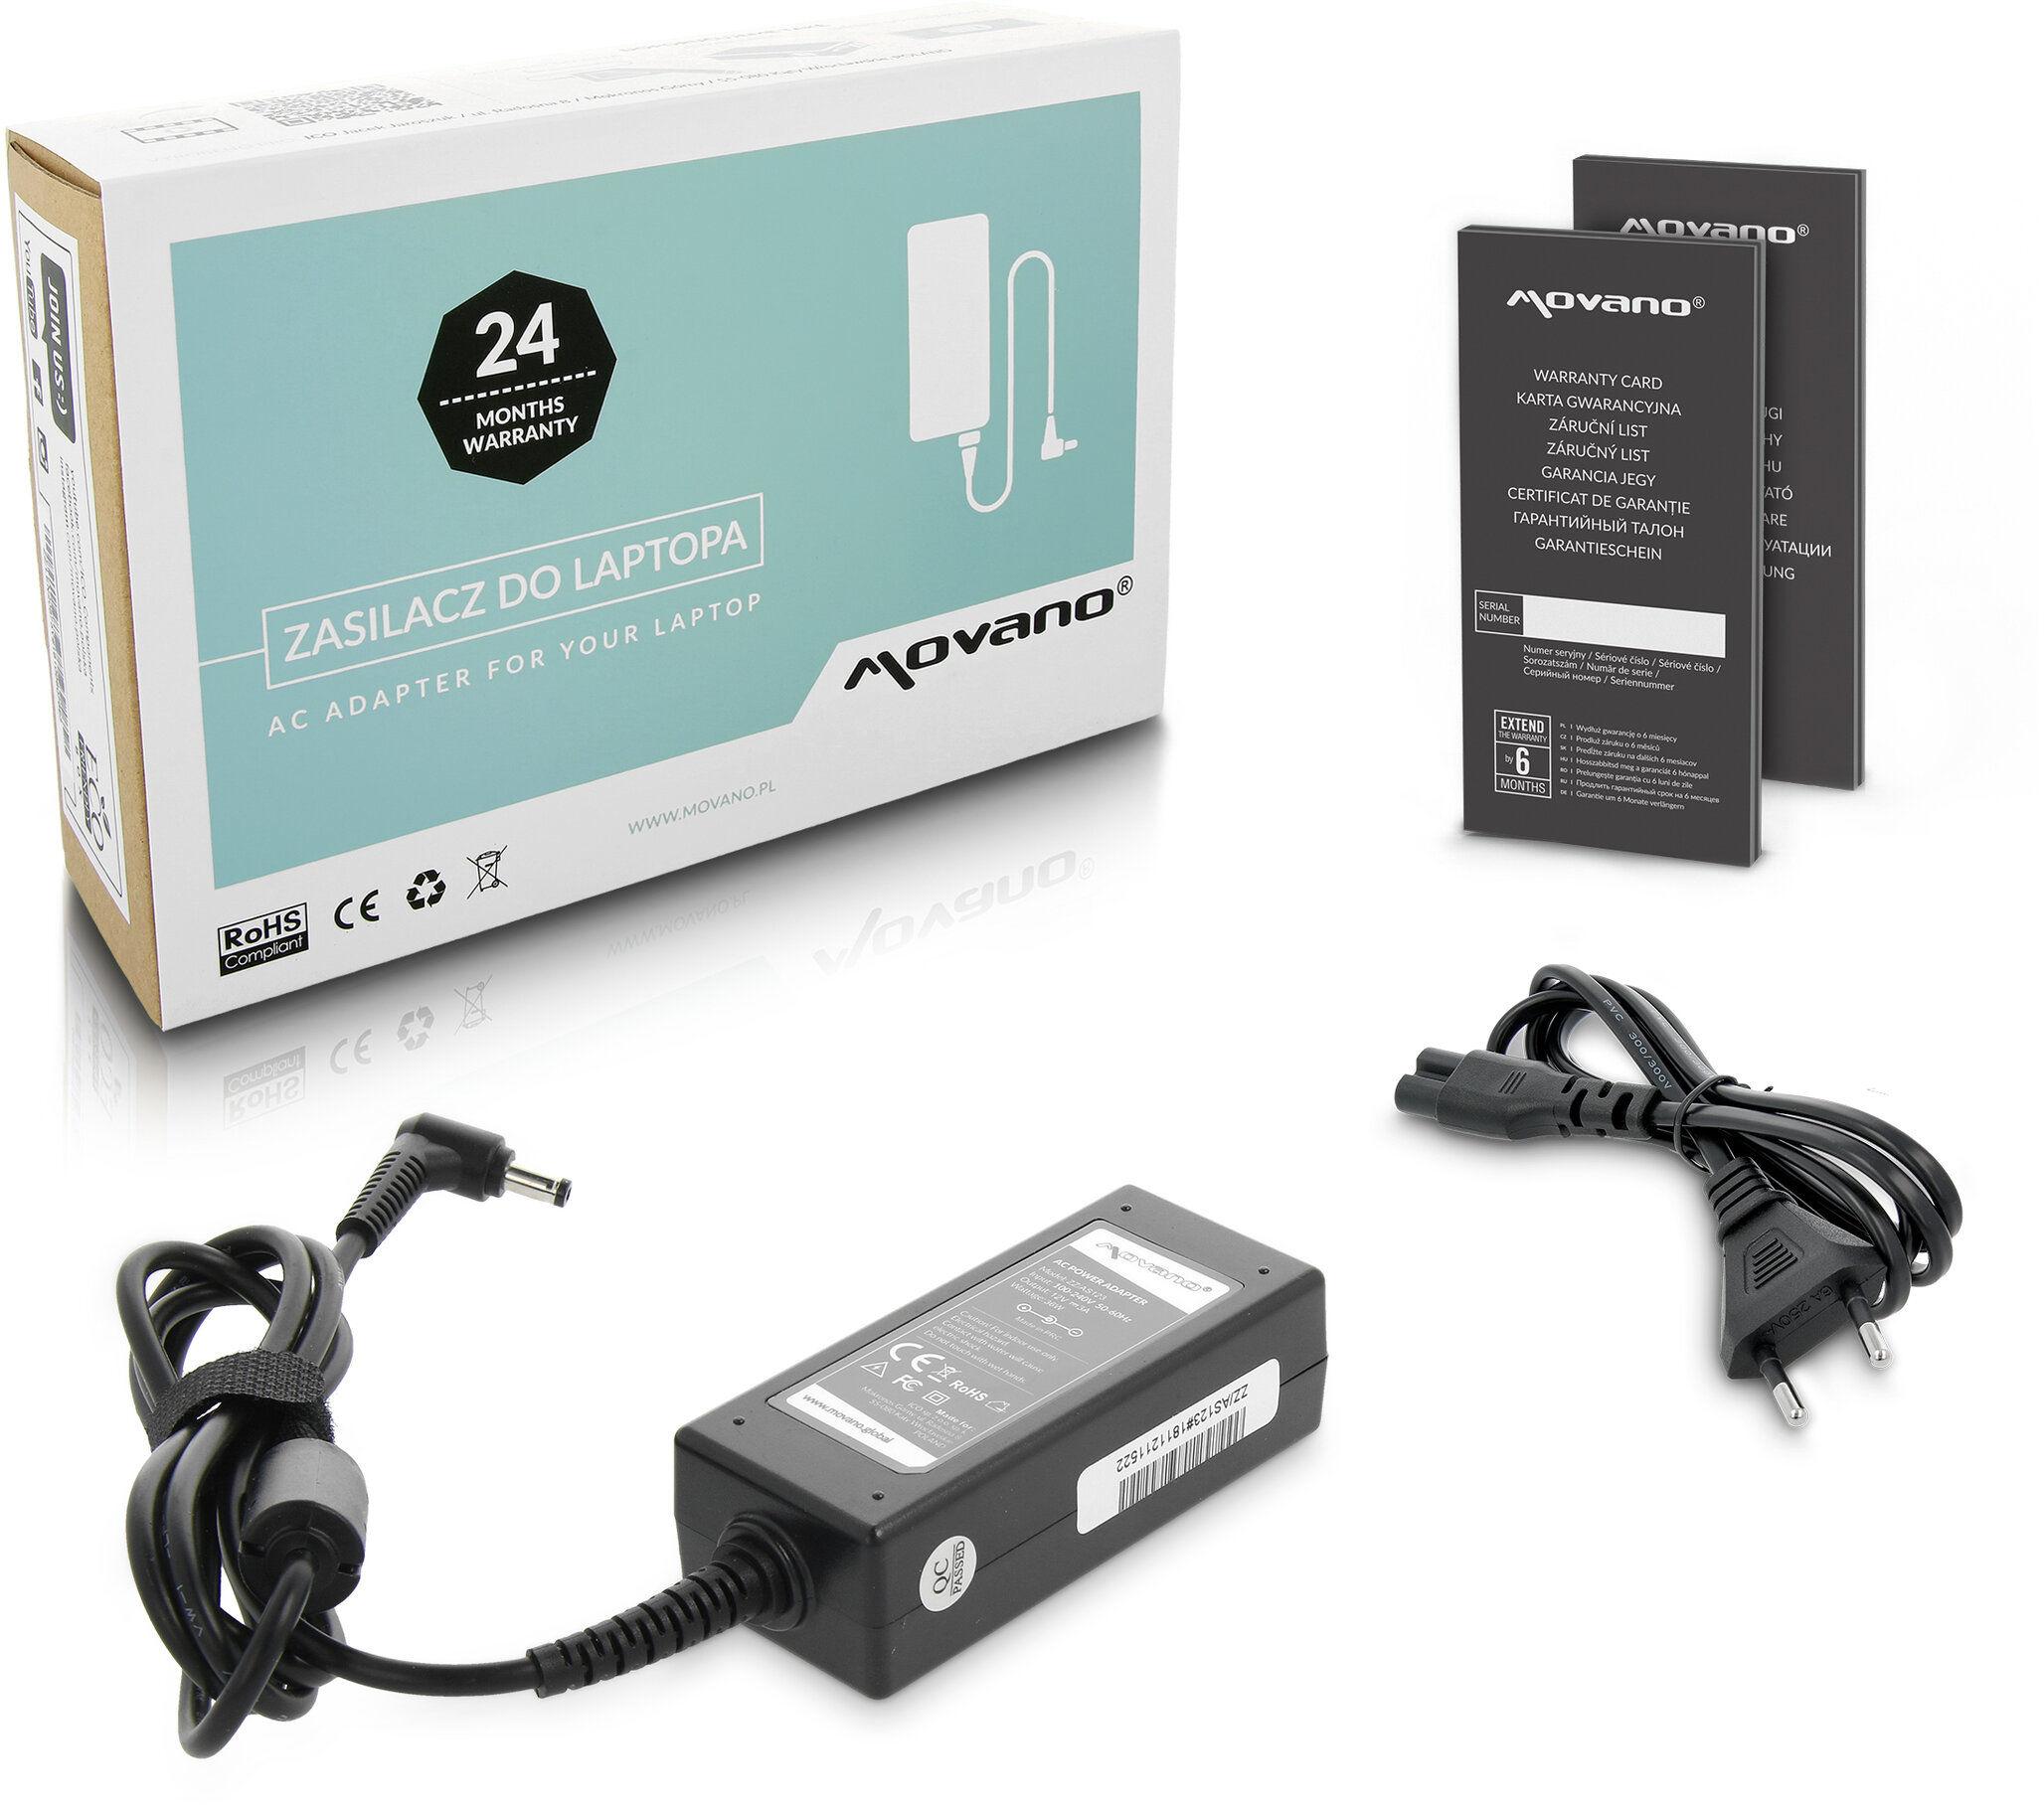 Zasilacz Asus eee PC 12V 3A 36W (1.7x4.8) ADP-36EH SMQ2175 Movano